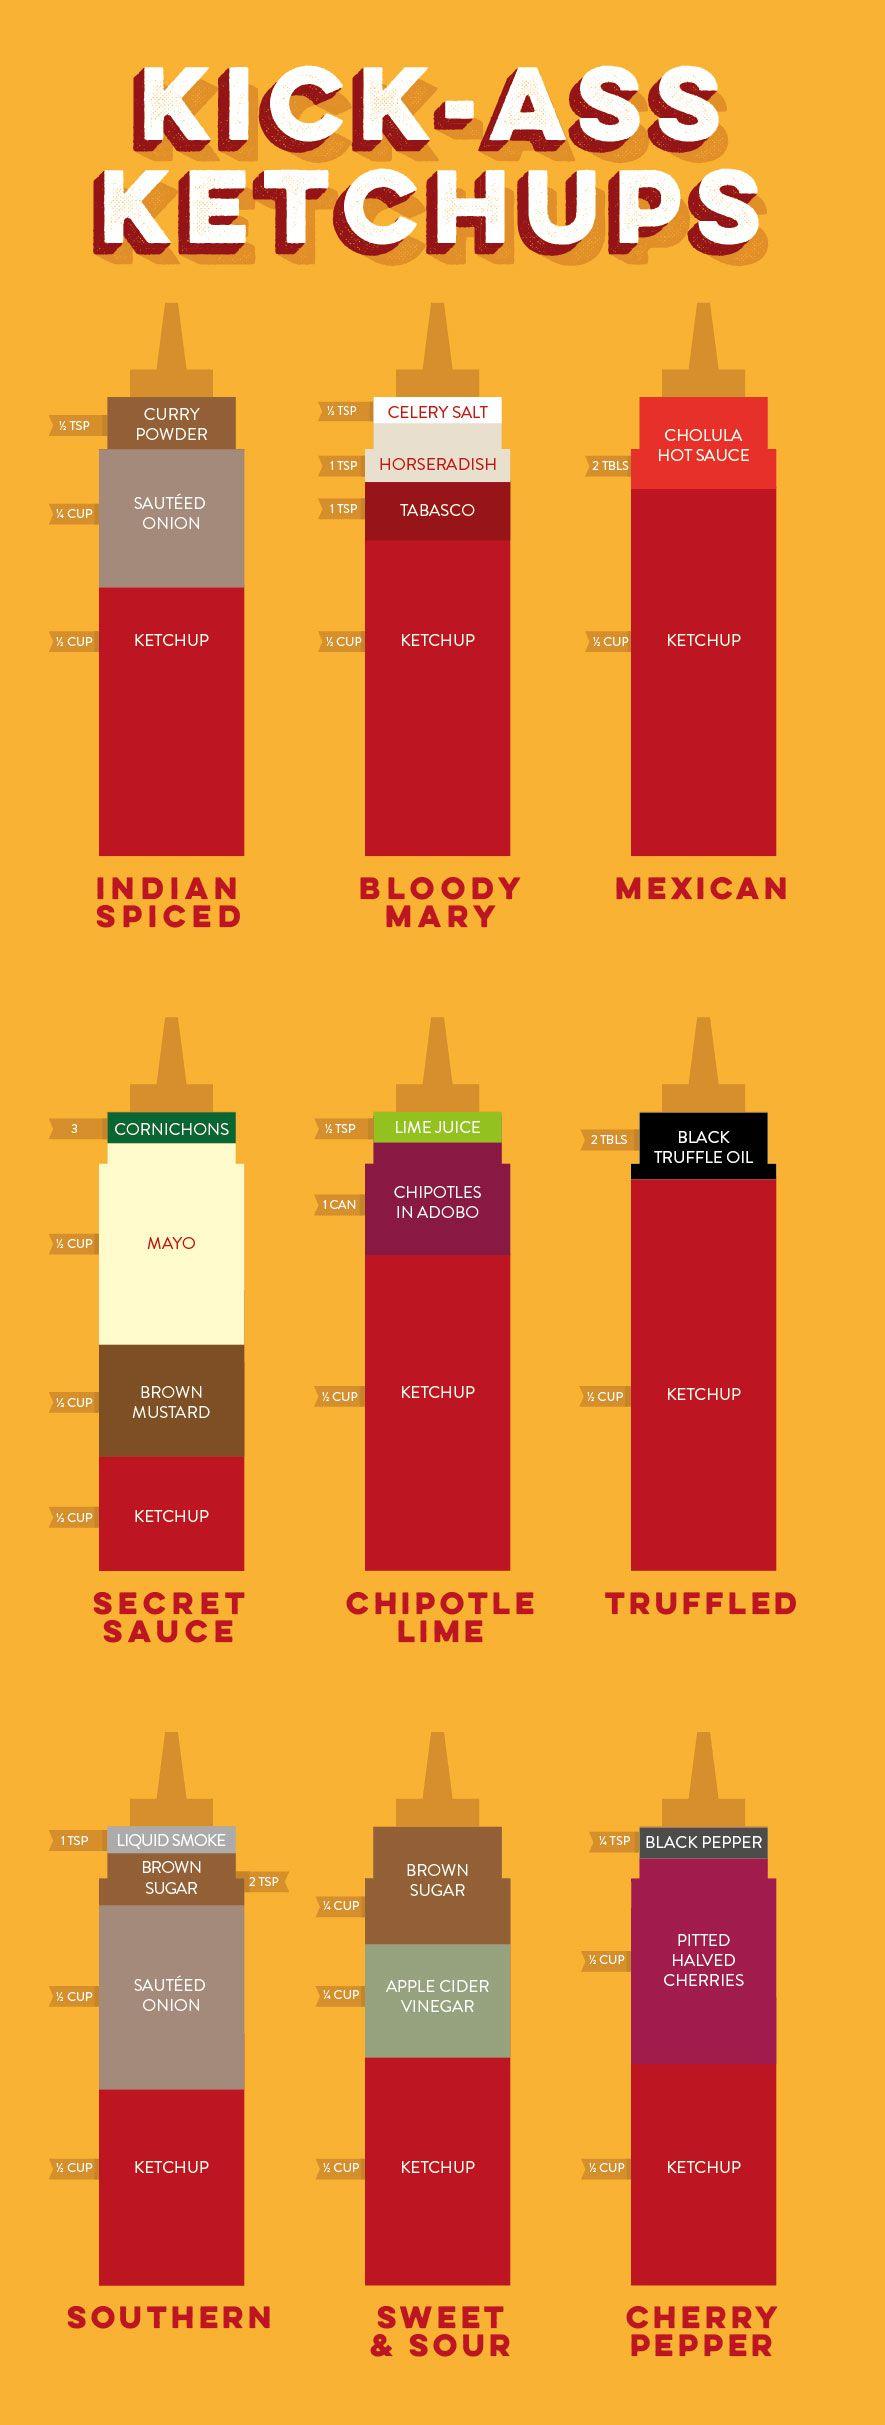 Sweet Sweet Ketchup Ketchup Recipe Professional Cooking Sauce